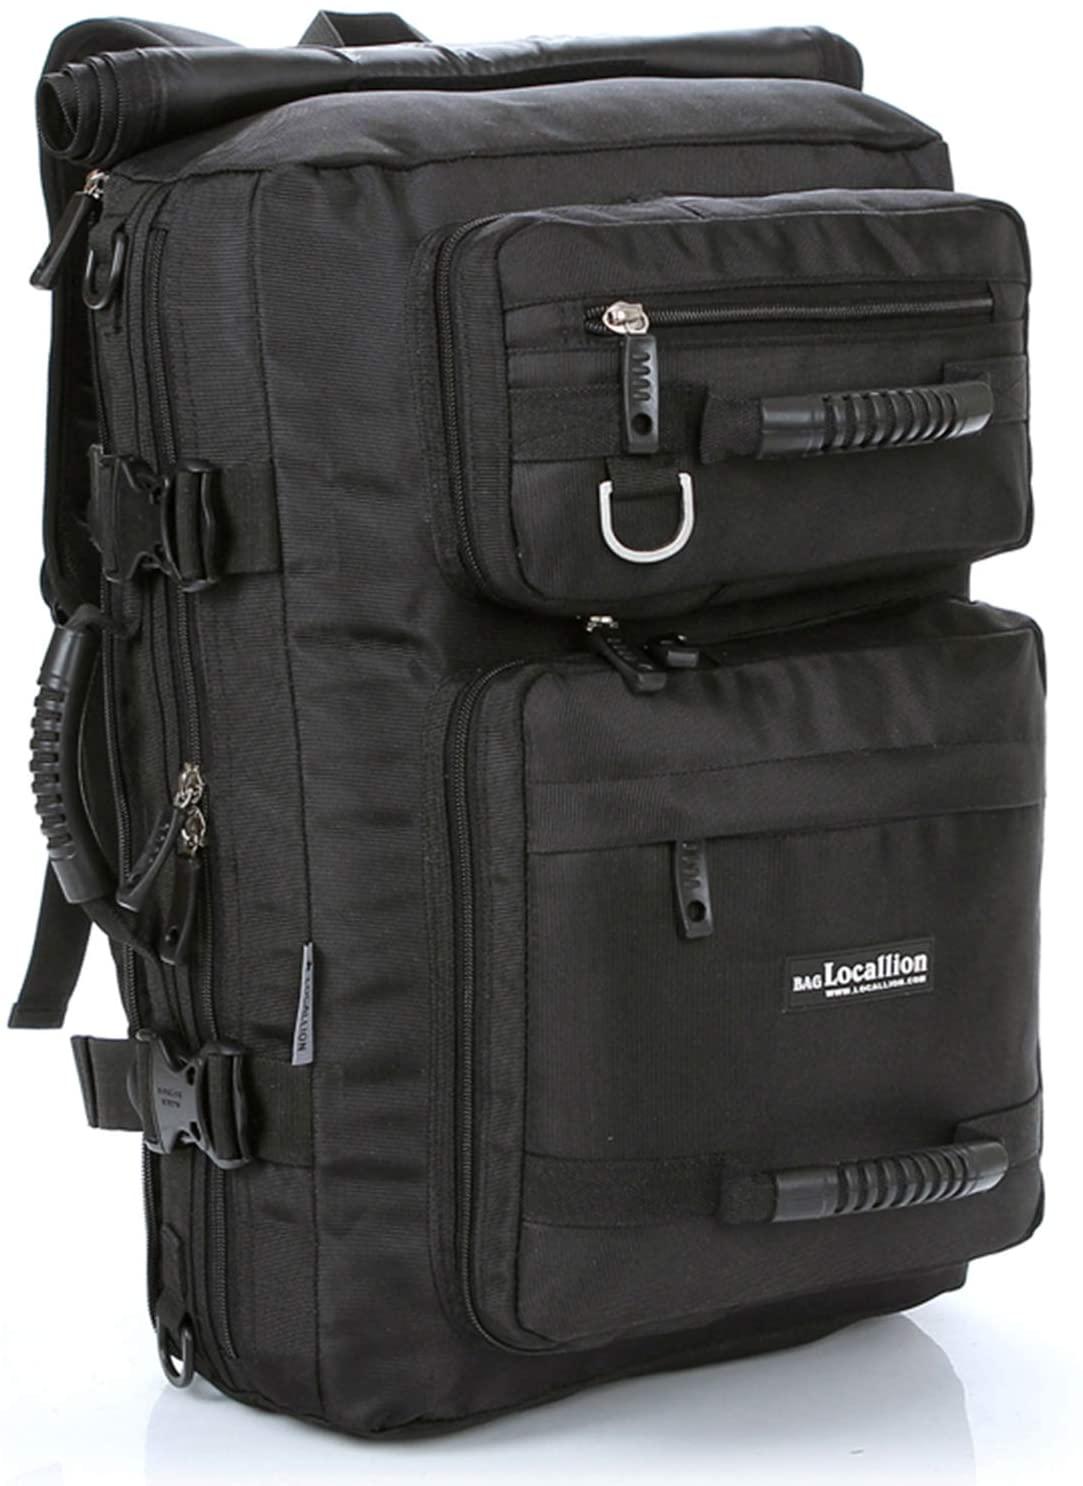 Scioltoo 30l Travel Laptop Backpack 15.6-inch Unisex Nylon Hiking Travel Bag.